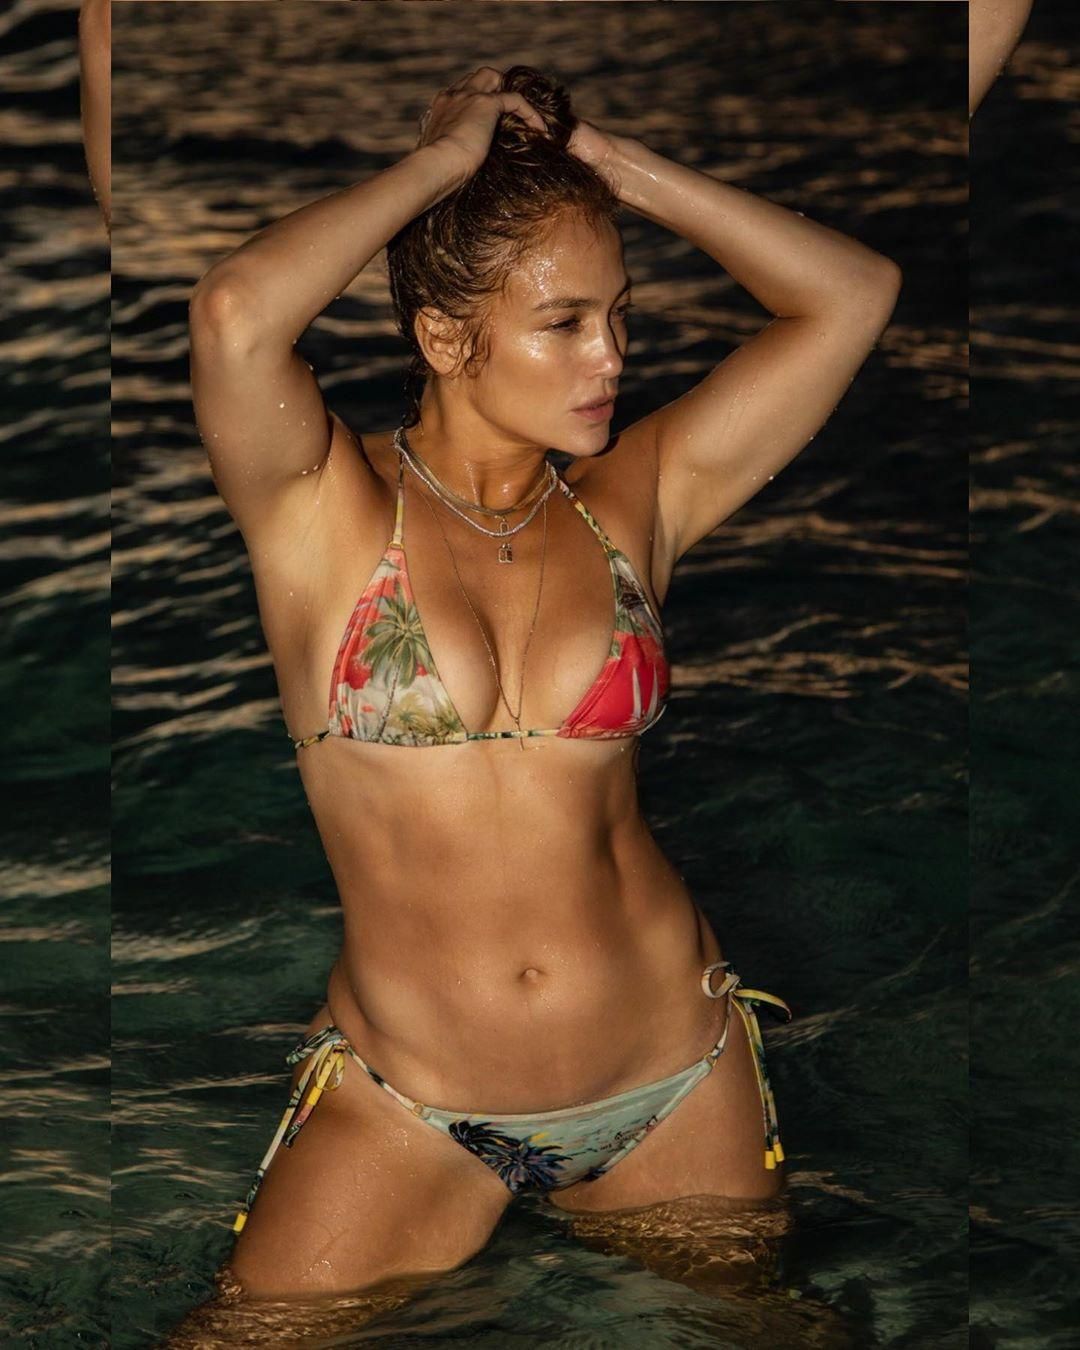 Дженнифер Лопес снялась в бикини / фото instagram.com/jlo